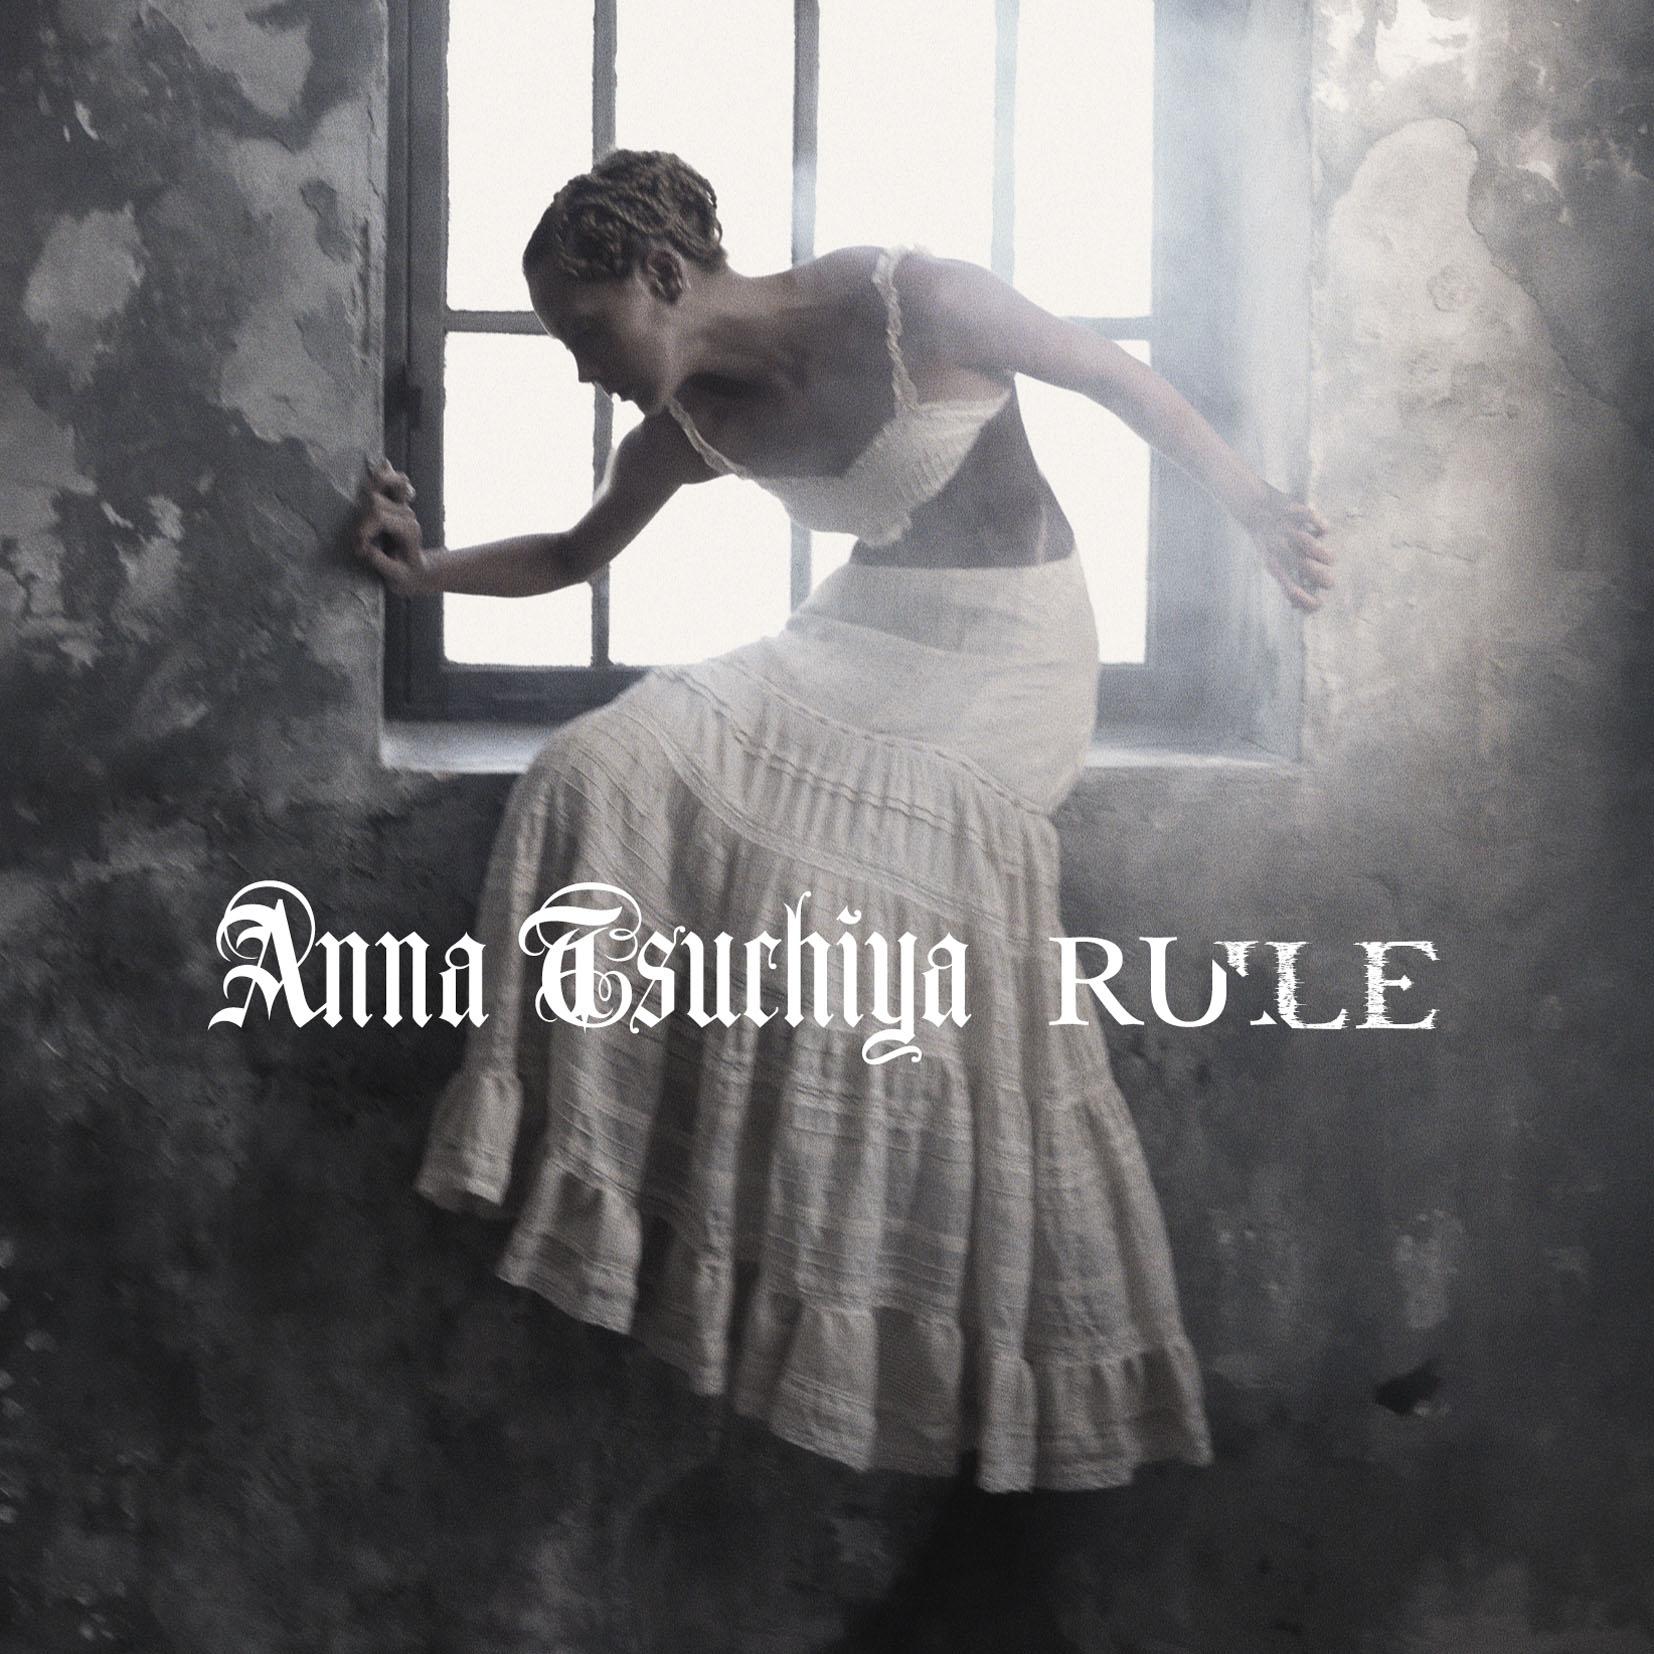 20160403.02.23 Anna Tsuchiya - Rule cover 1.jpg